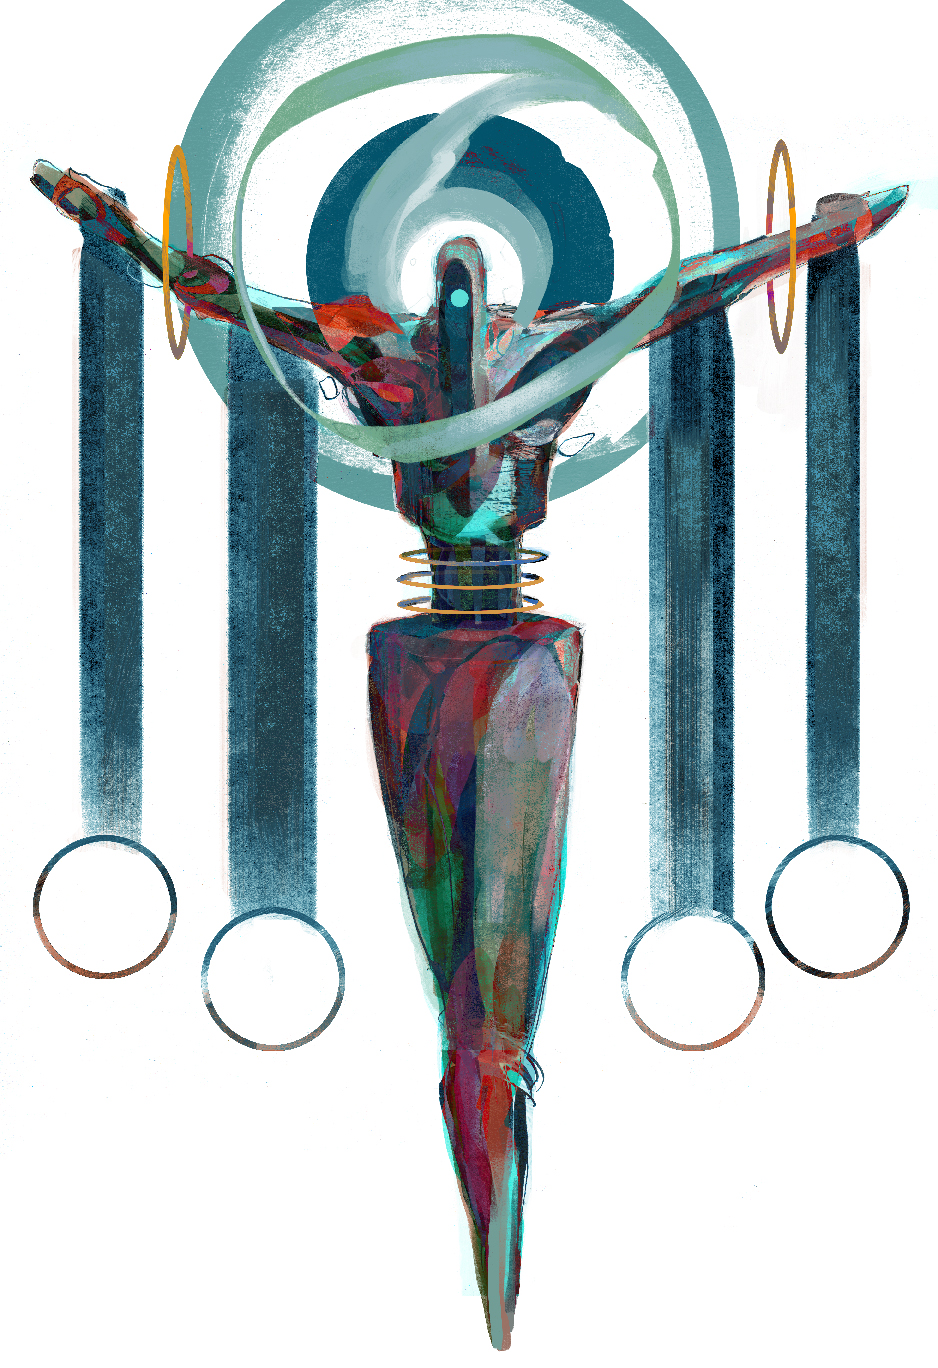 Sahaqiel art by Eli Minaya